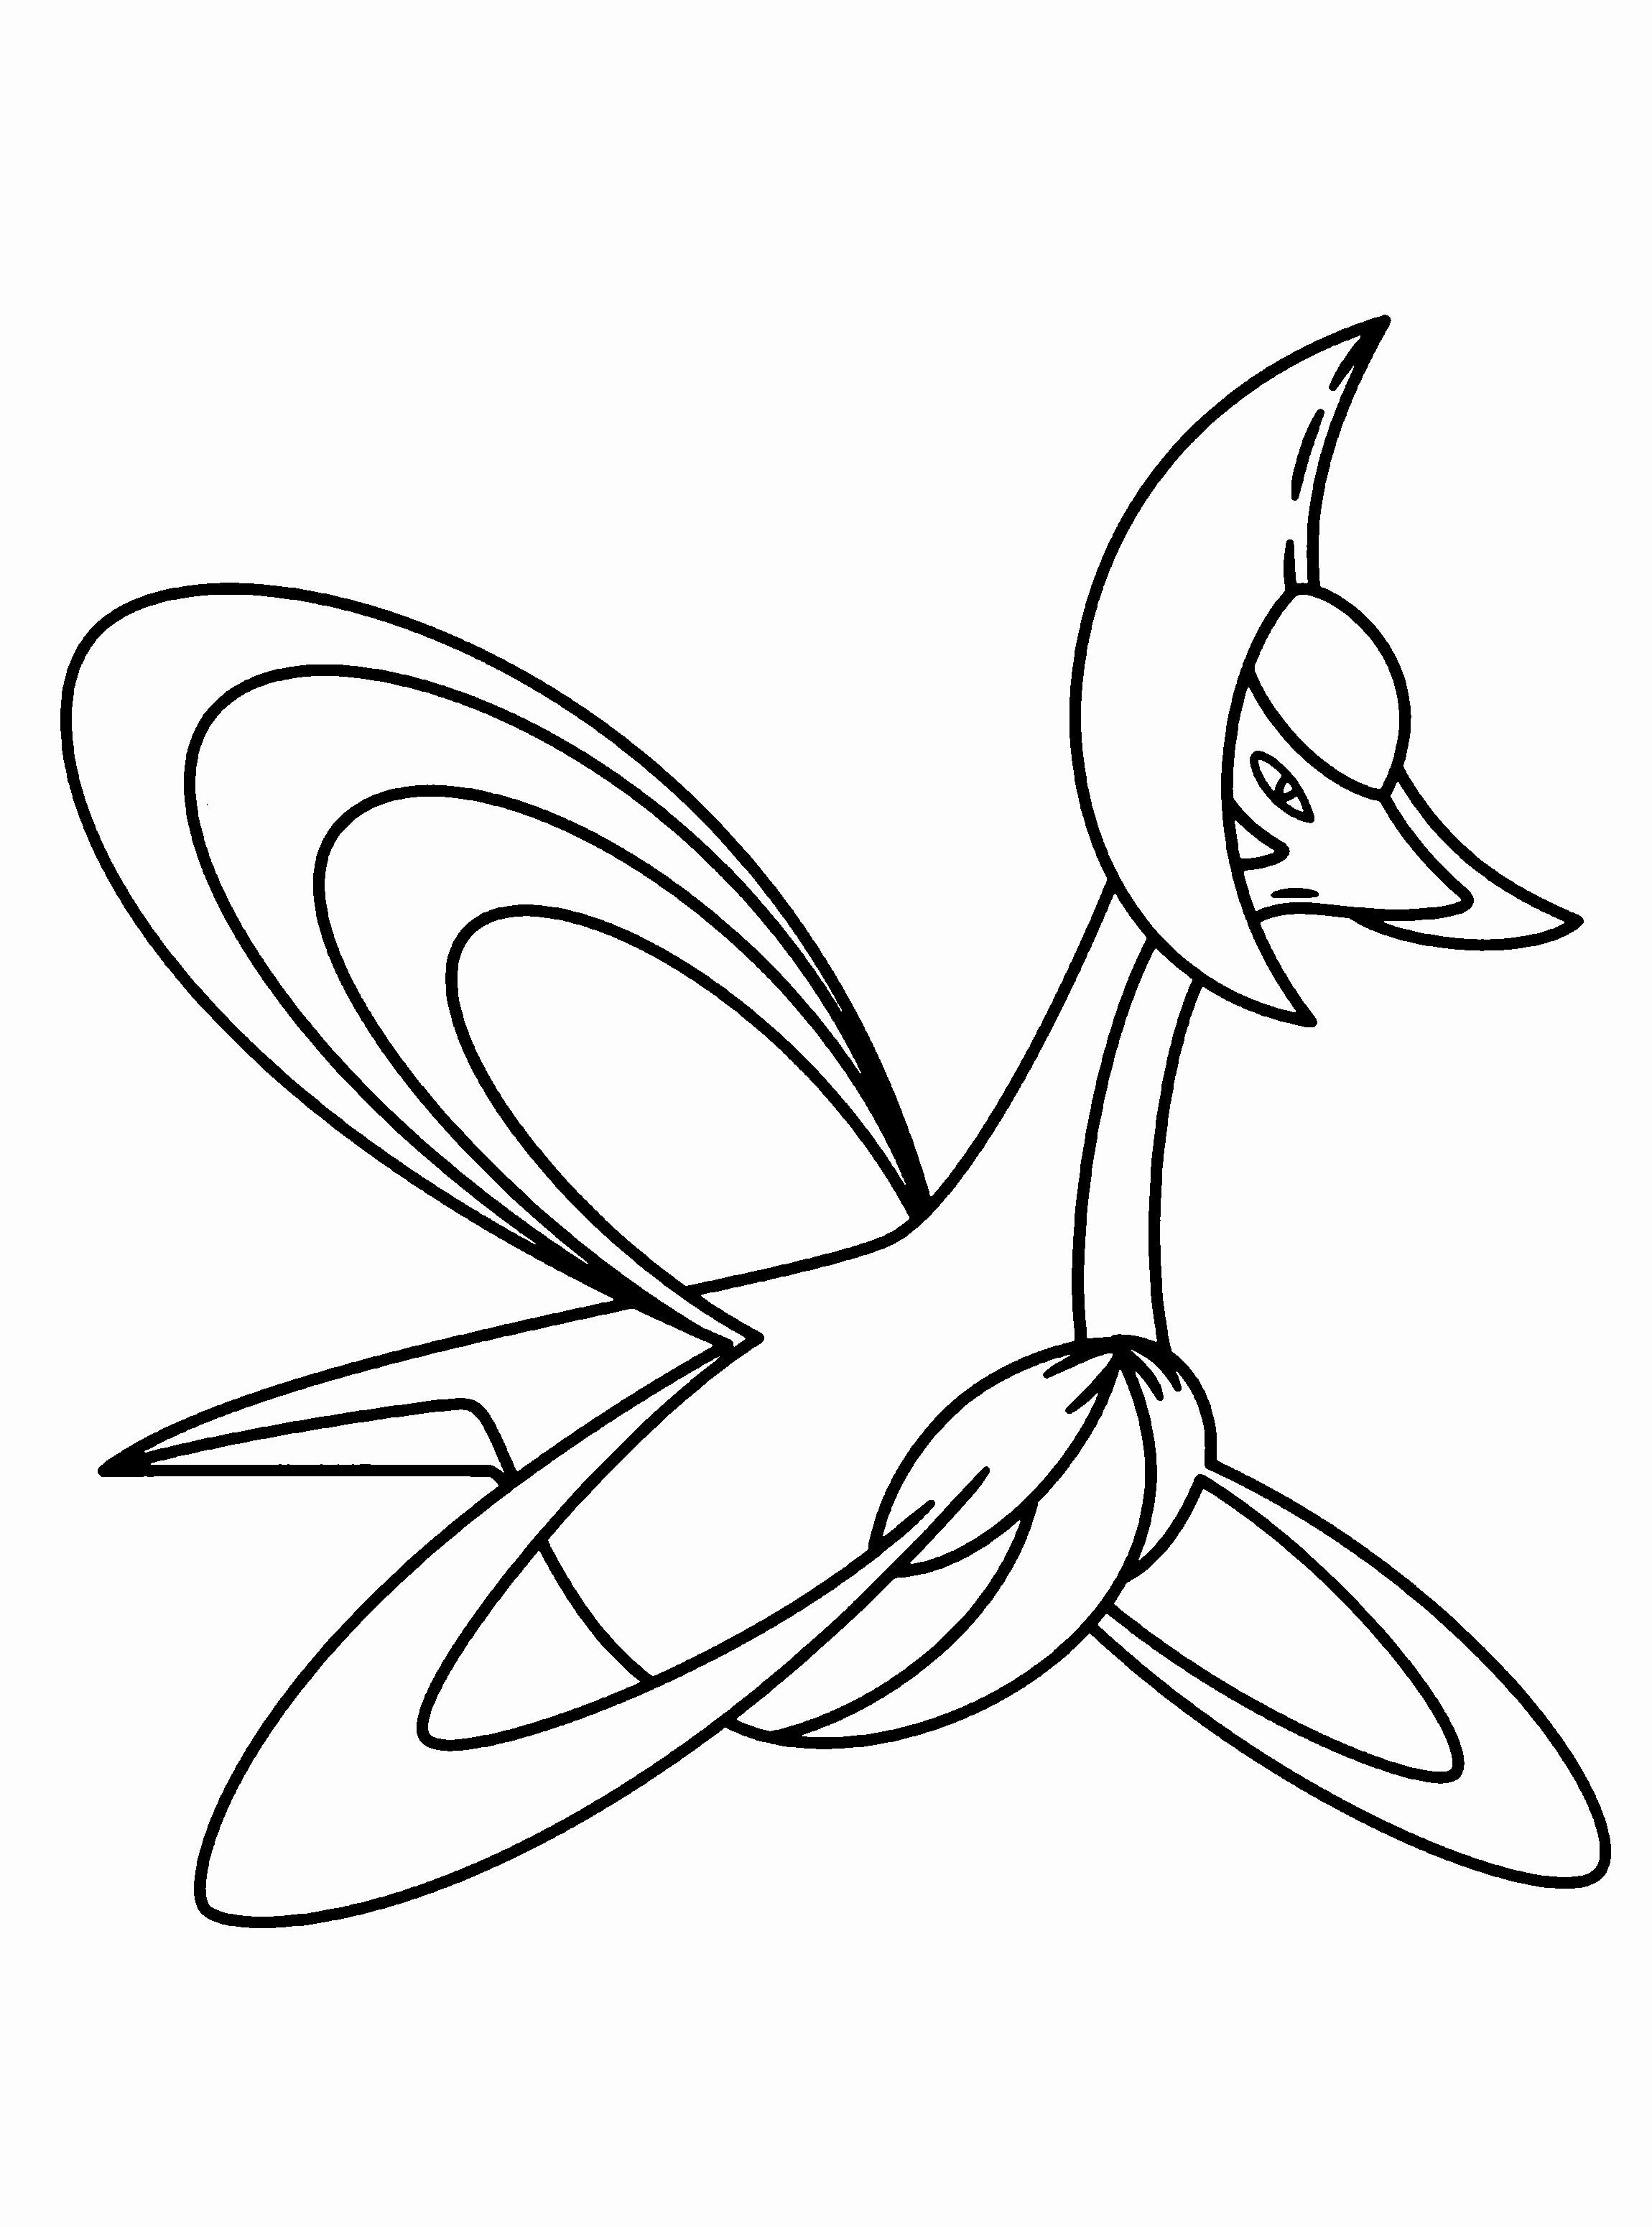 Ausmalbilder Pokemon Plinfa Das Beste Von Pokemon Kleurplaten Uniek Pokemon Diamond Pearl Ausmalbilder Bild